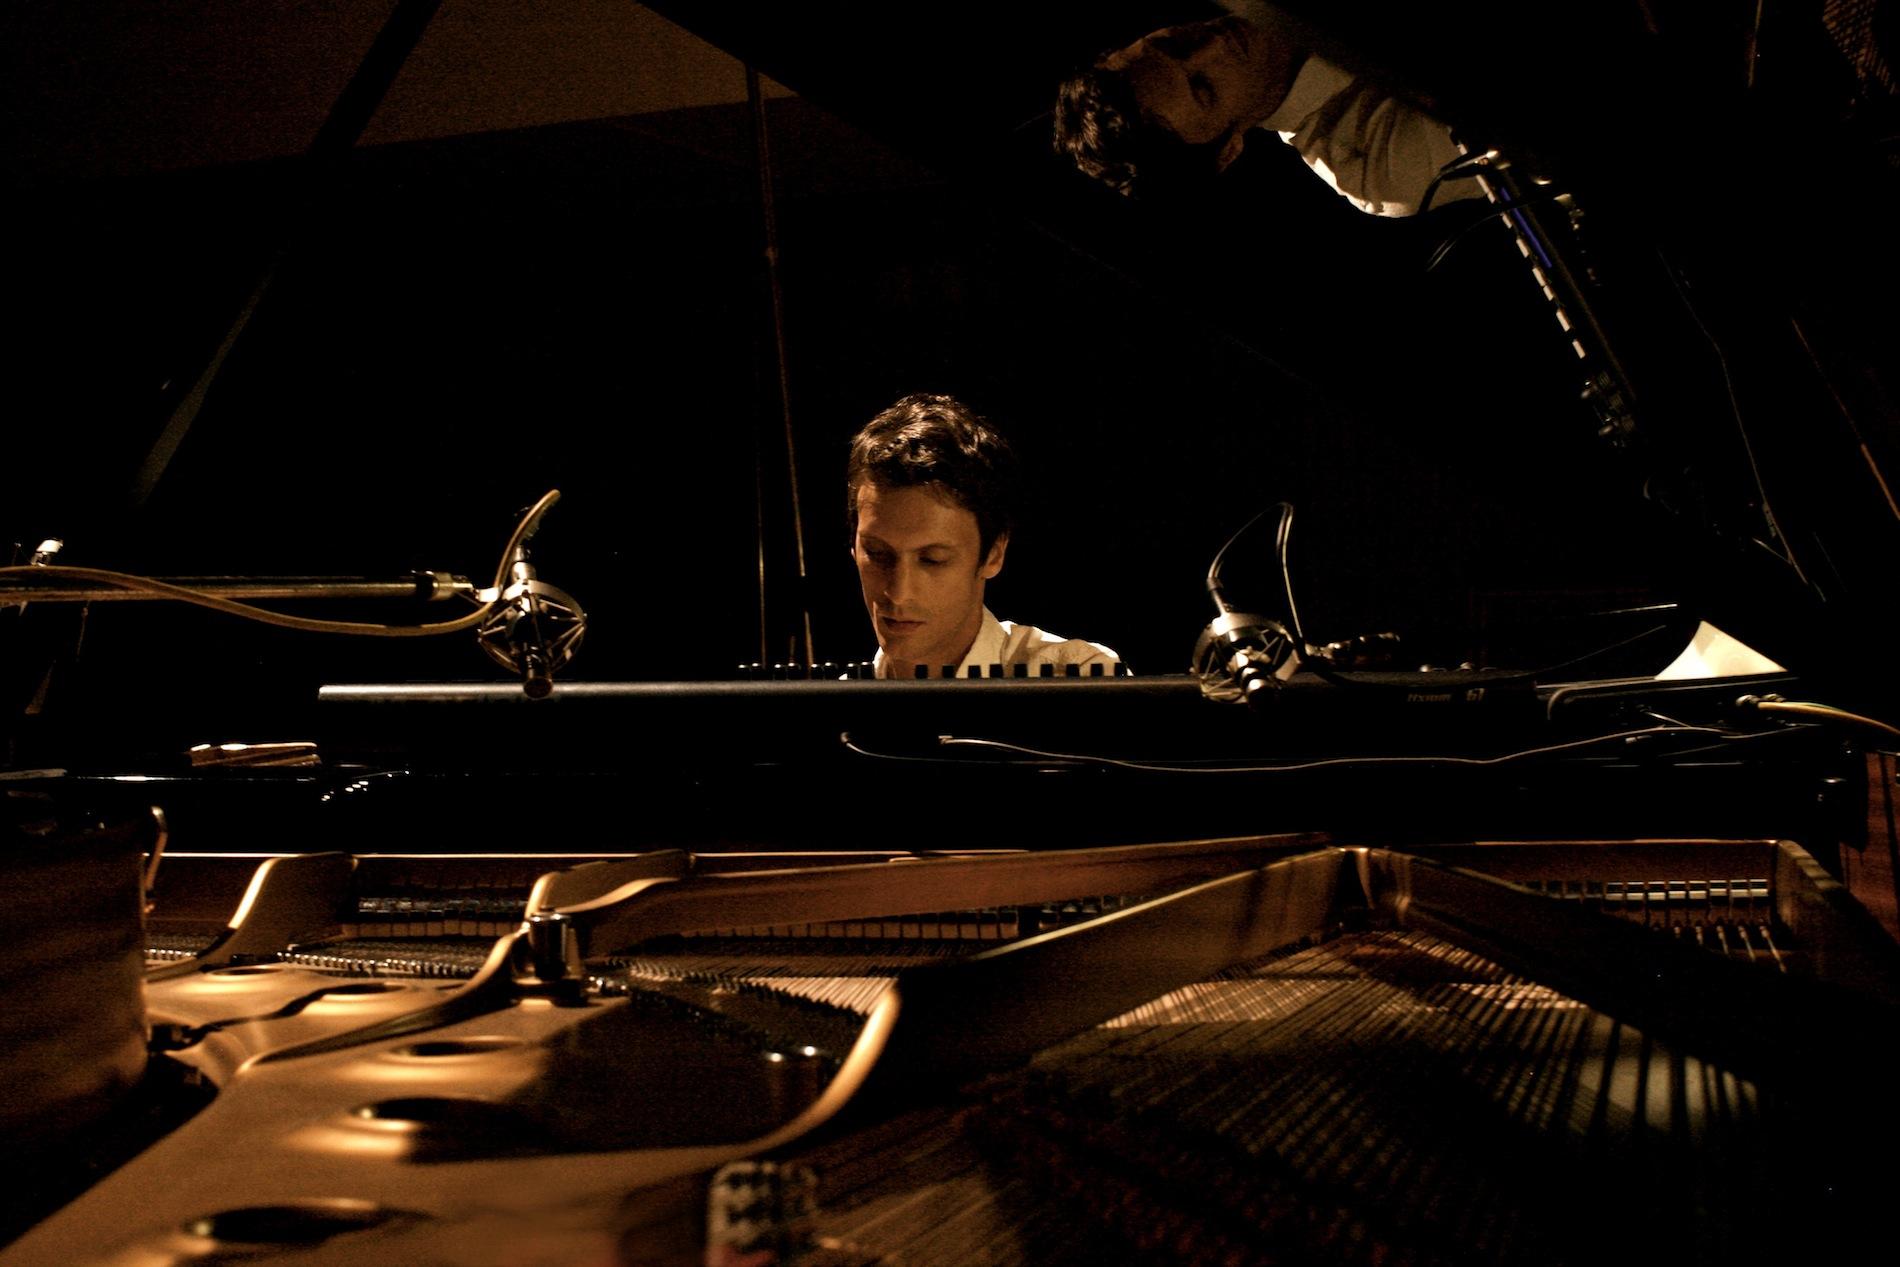 Transoriental recording session